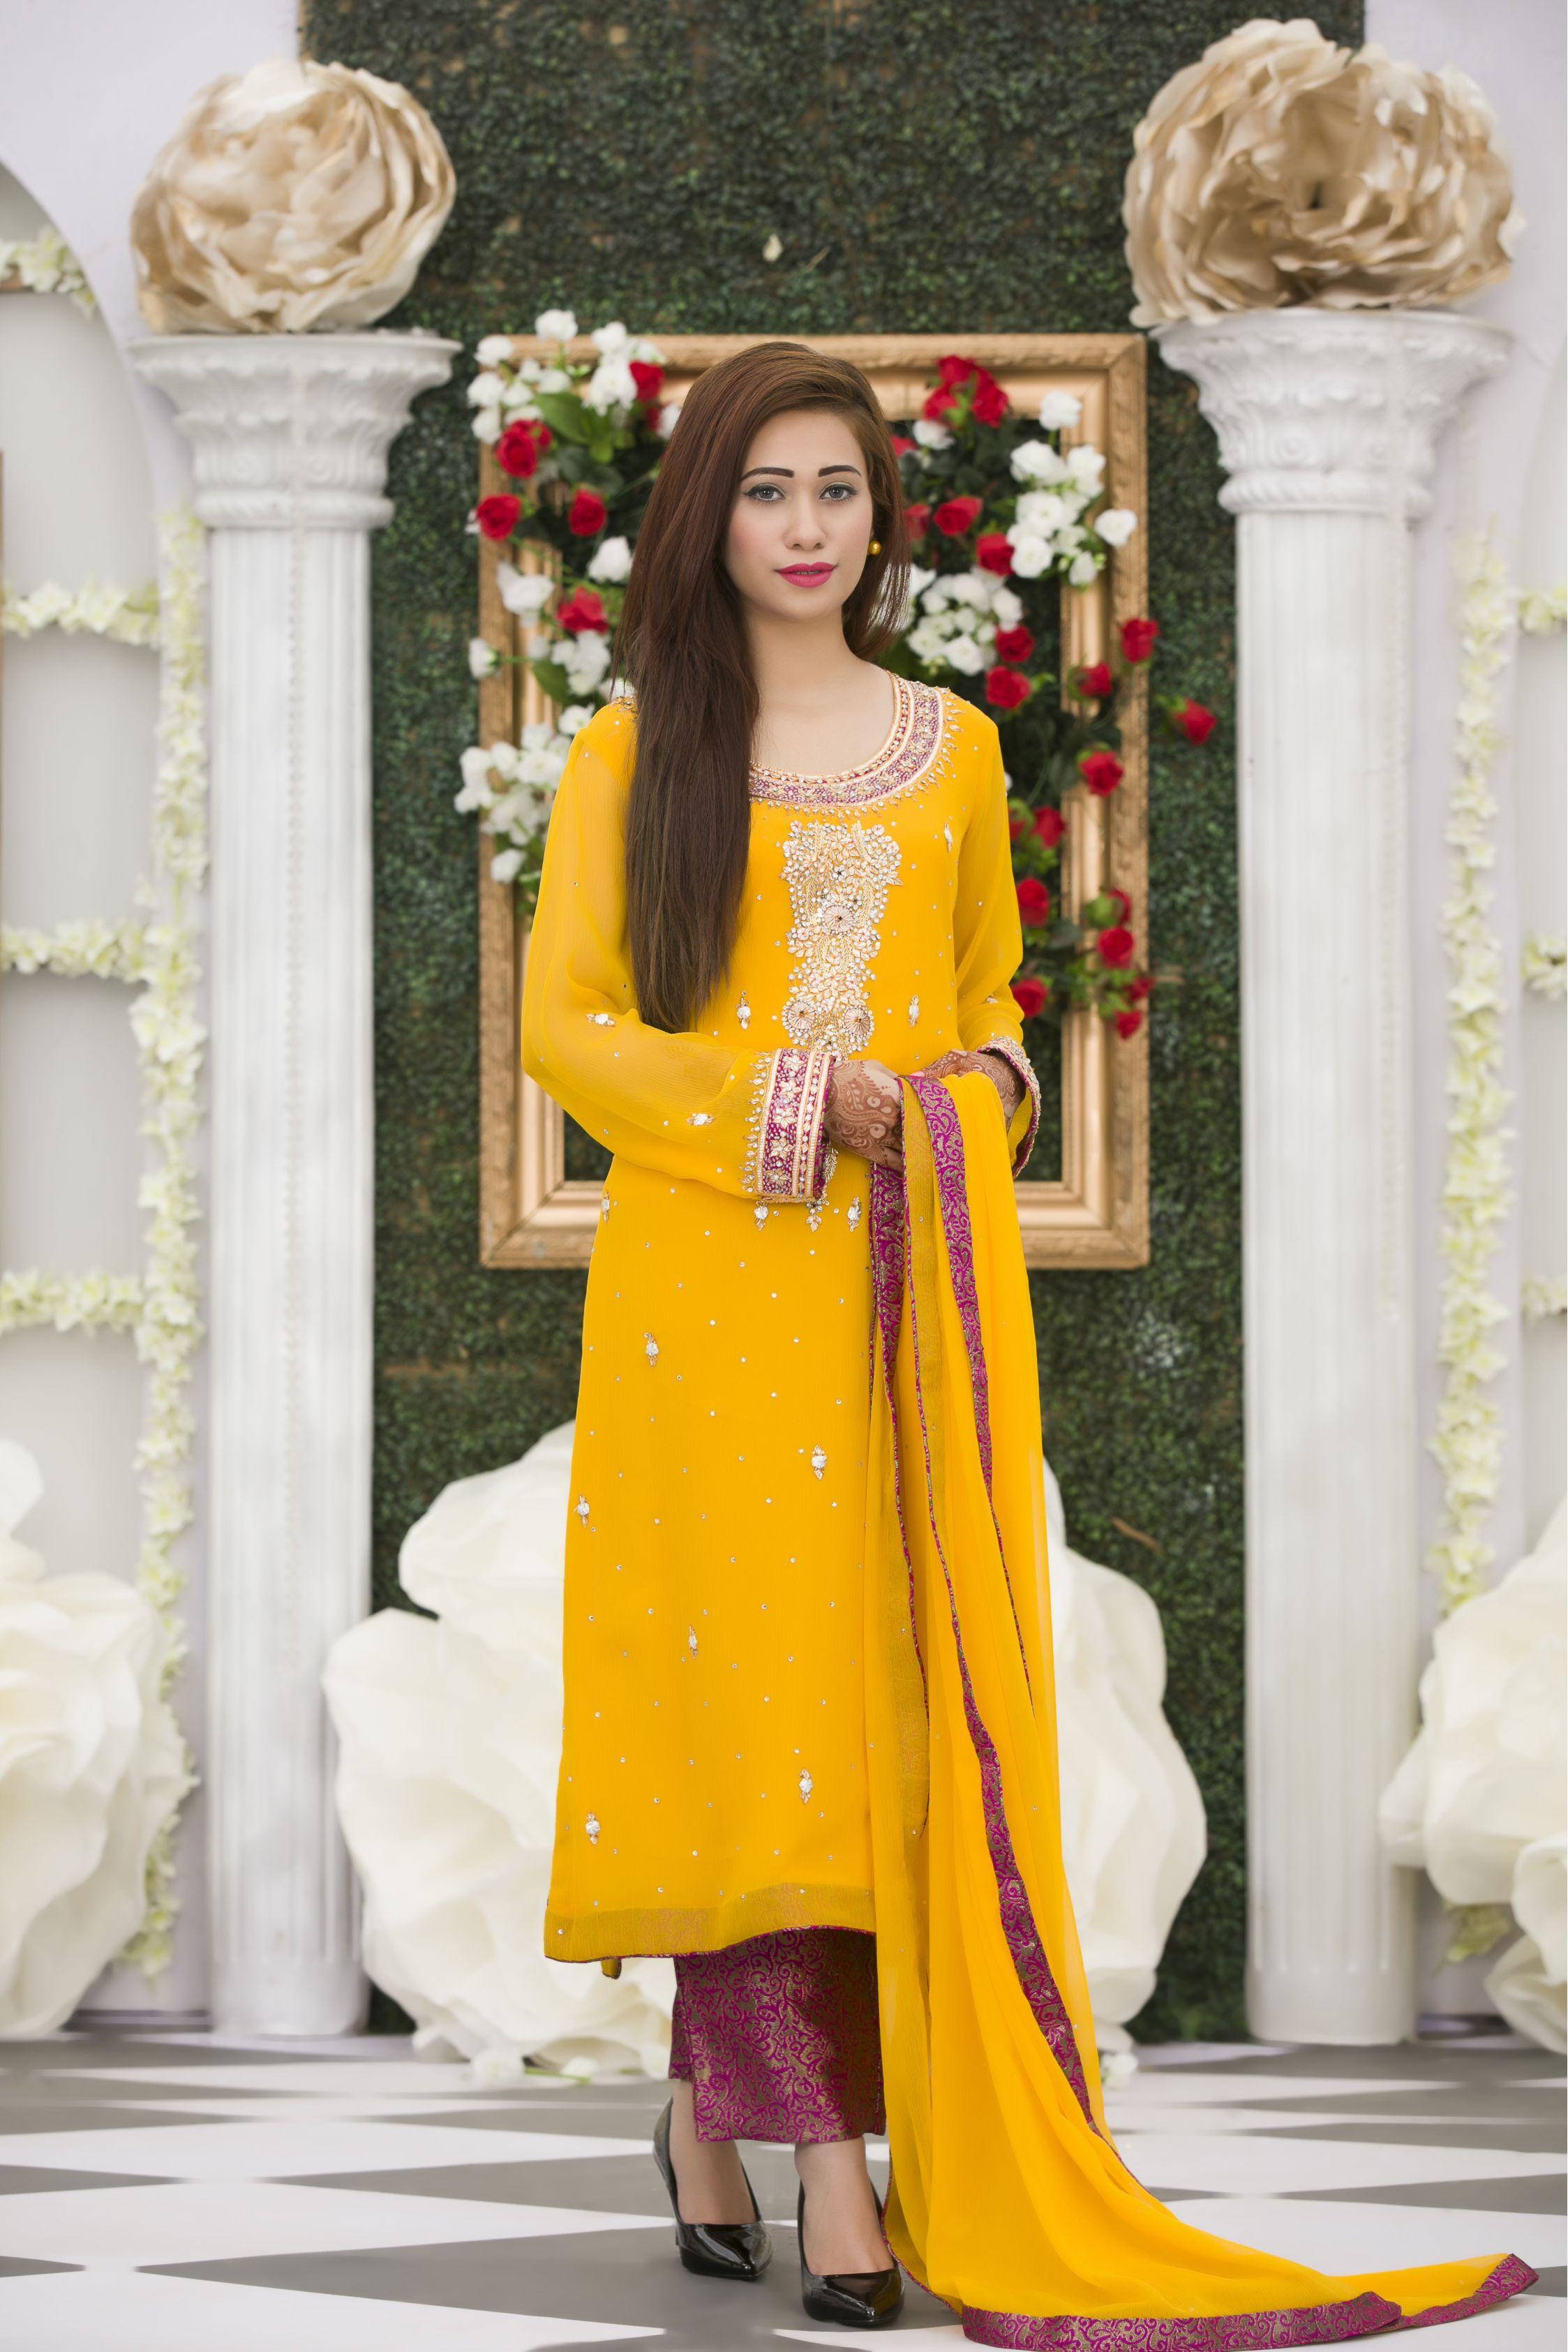 Exclusive yellow magenta mehndi dress for Pakistani wedding mehndi dresses